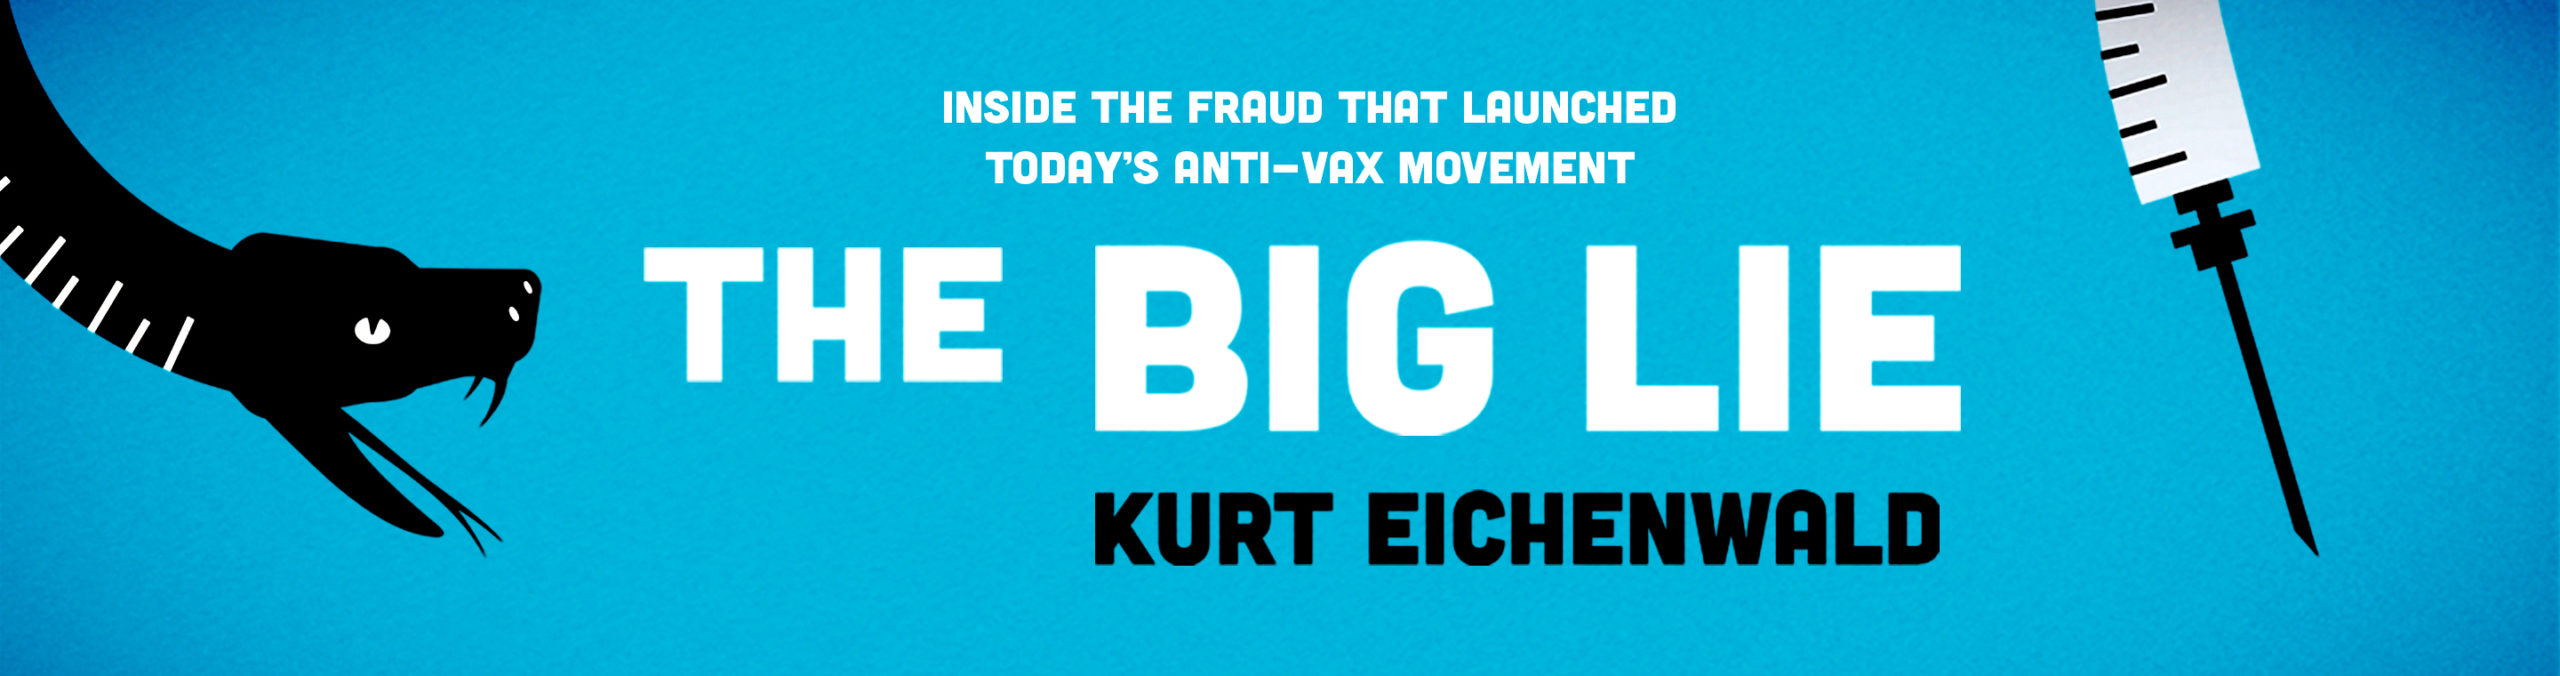 Kurt Eichenwald on the deadly lies spread by anti-vaxxer Andrew Wakefield